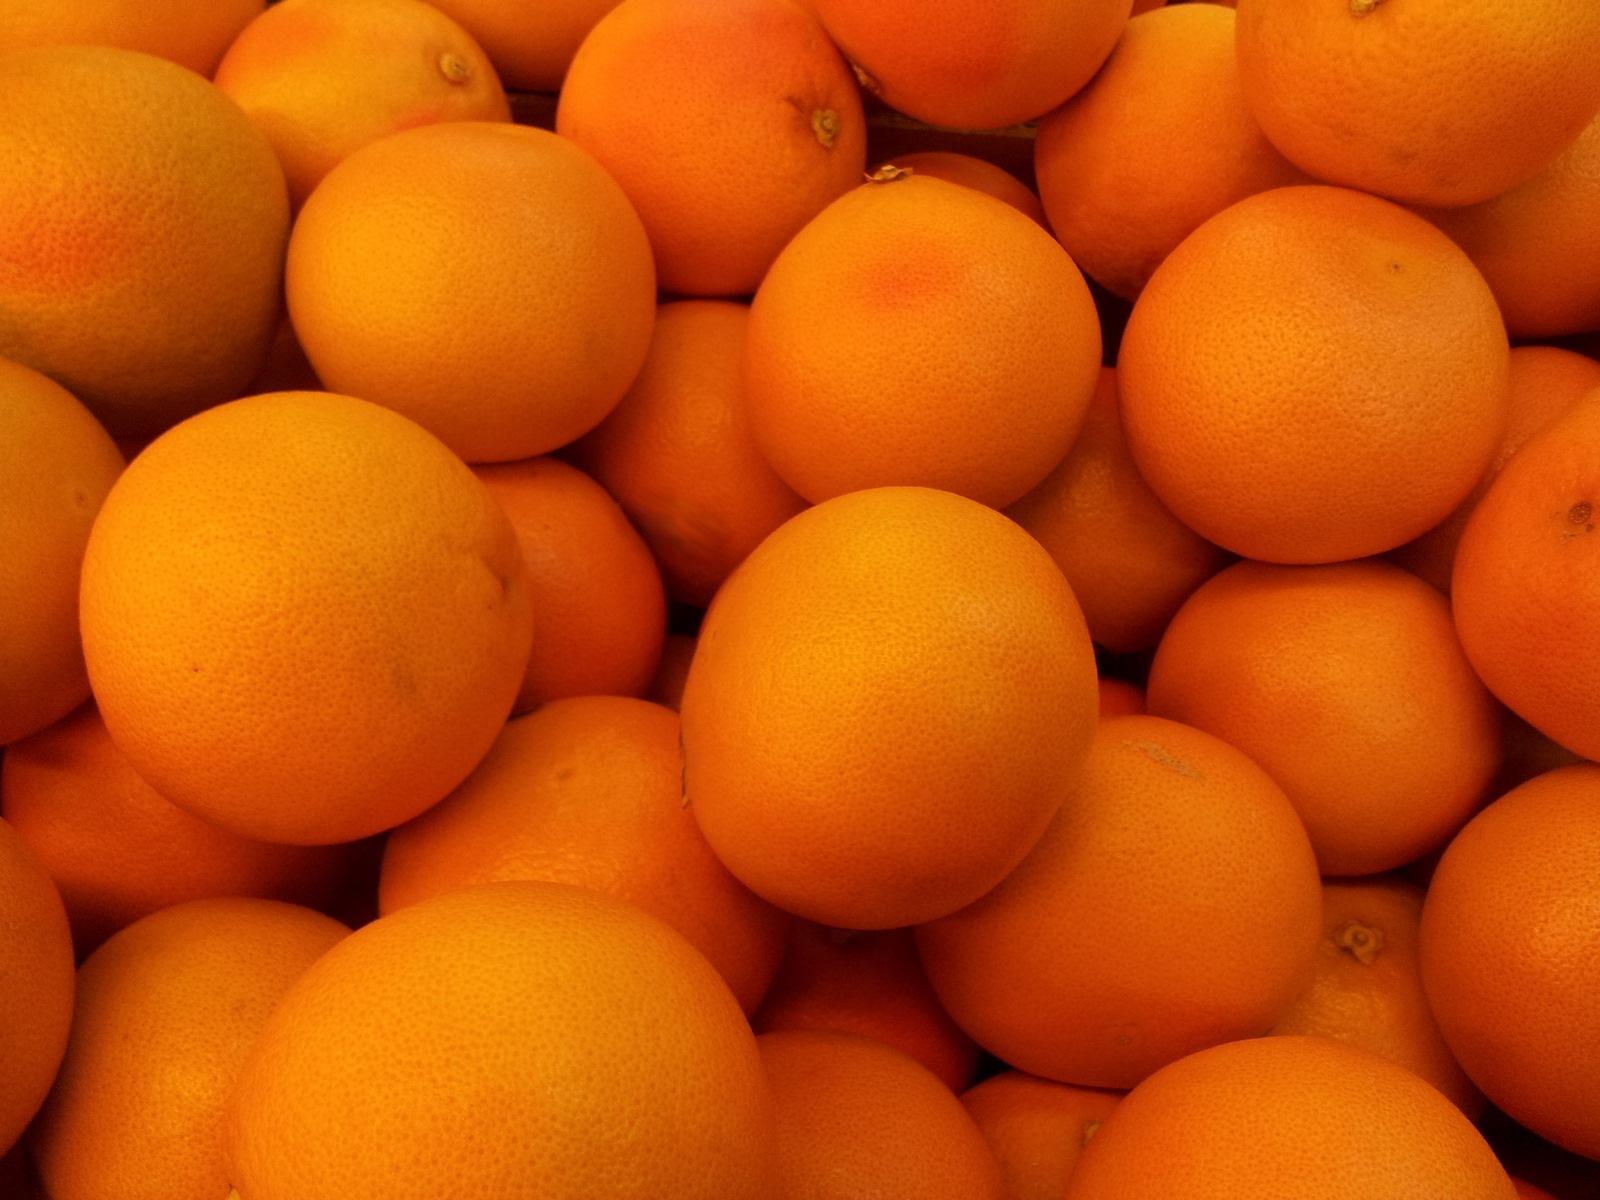 welche citruspflanze hat laenglivhe